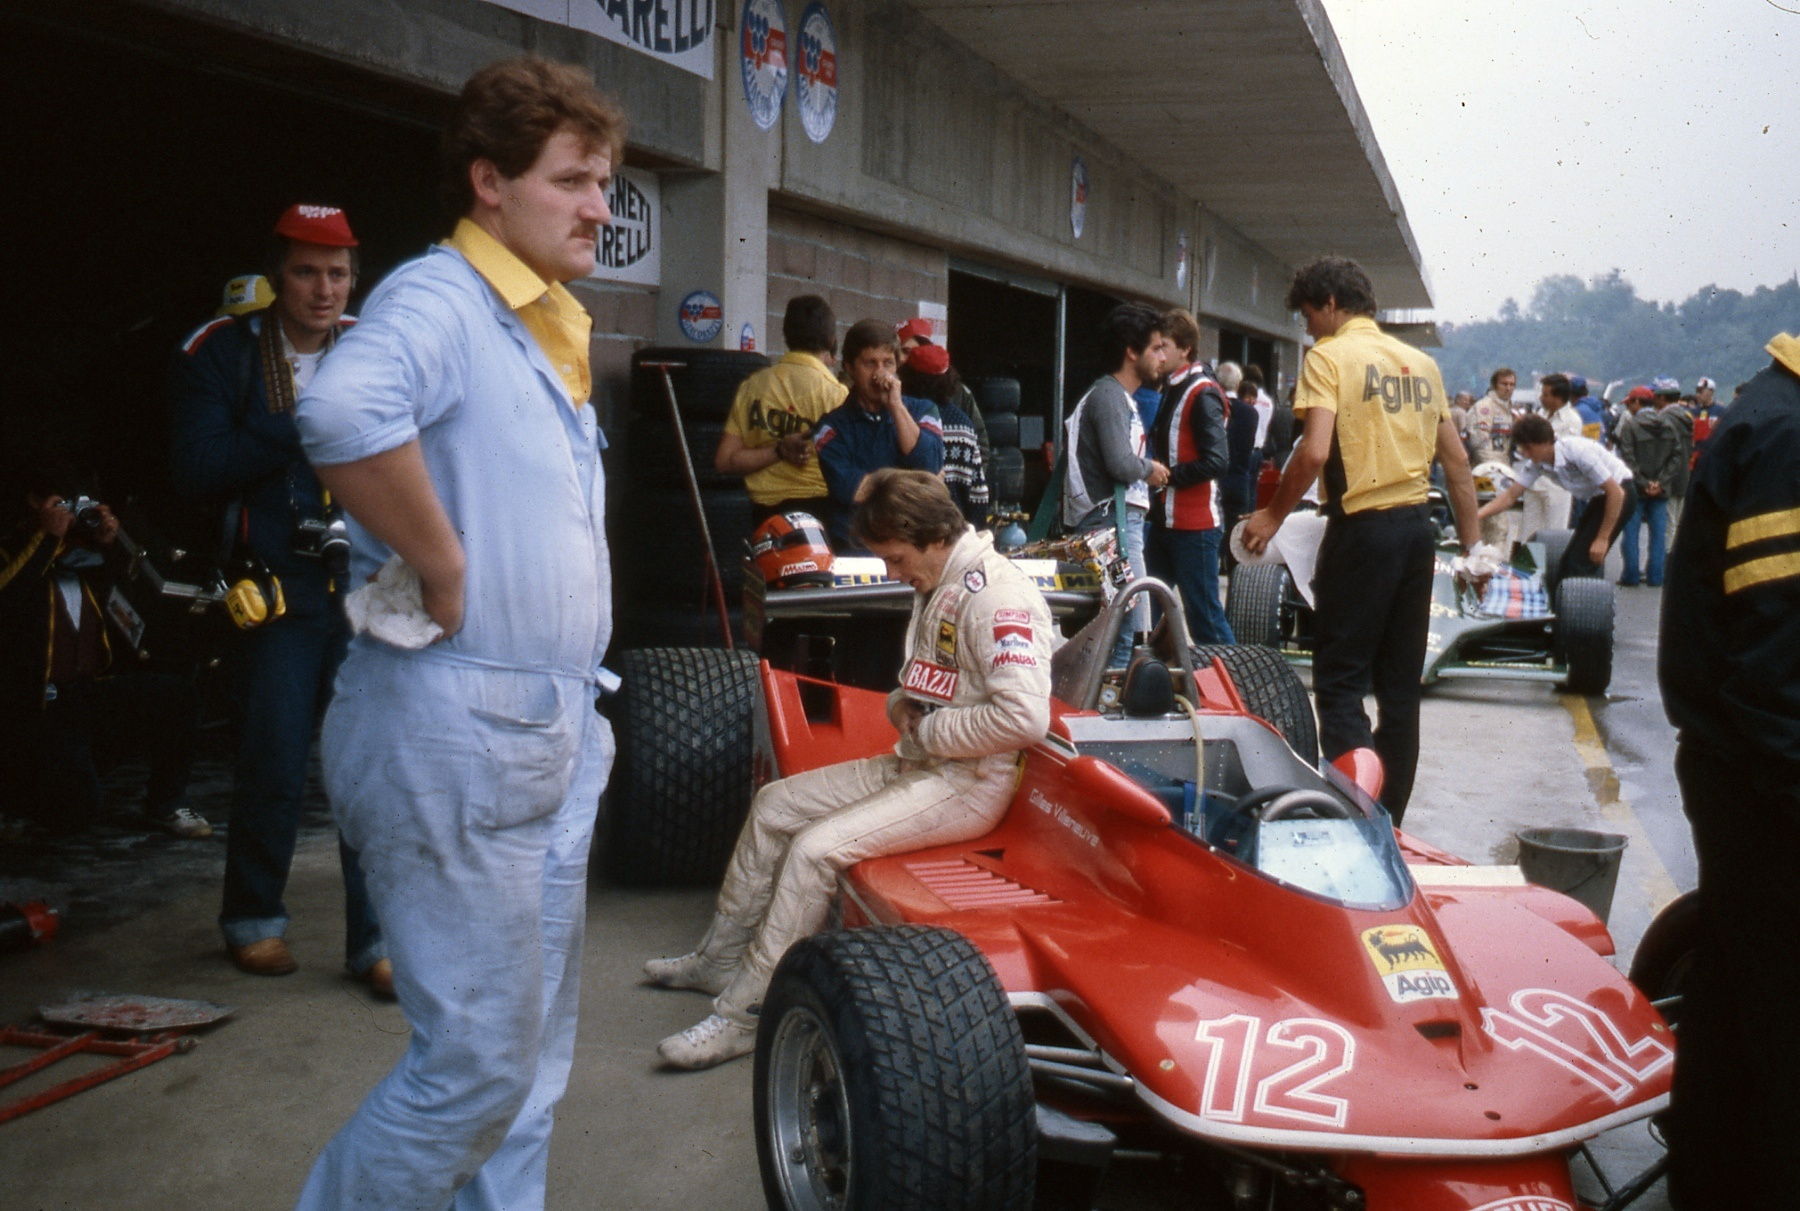 Gilles Villeneuve at Imola GP in 1979